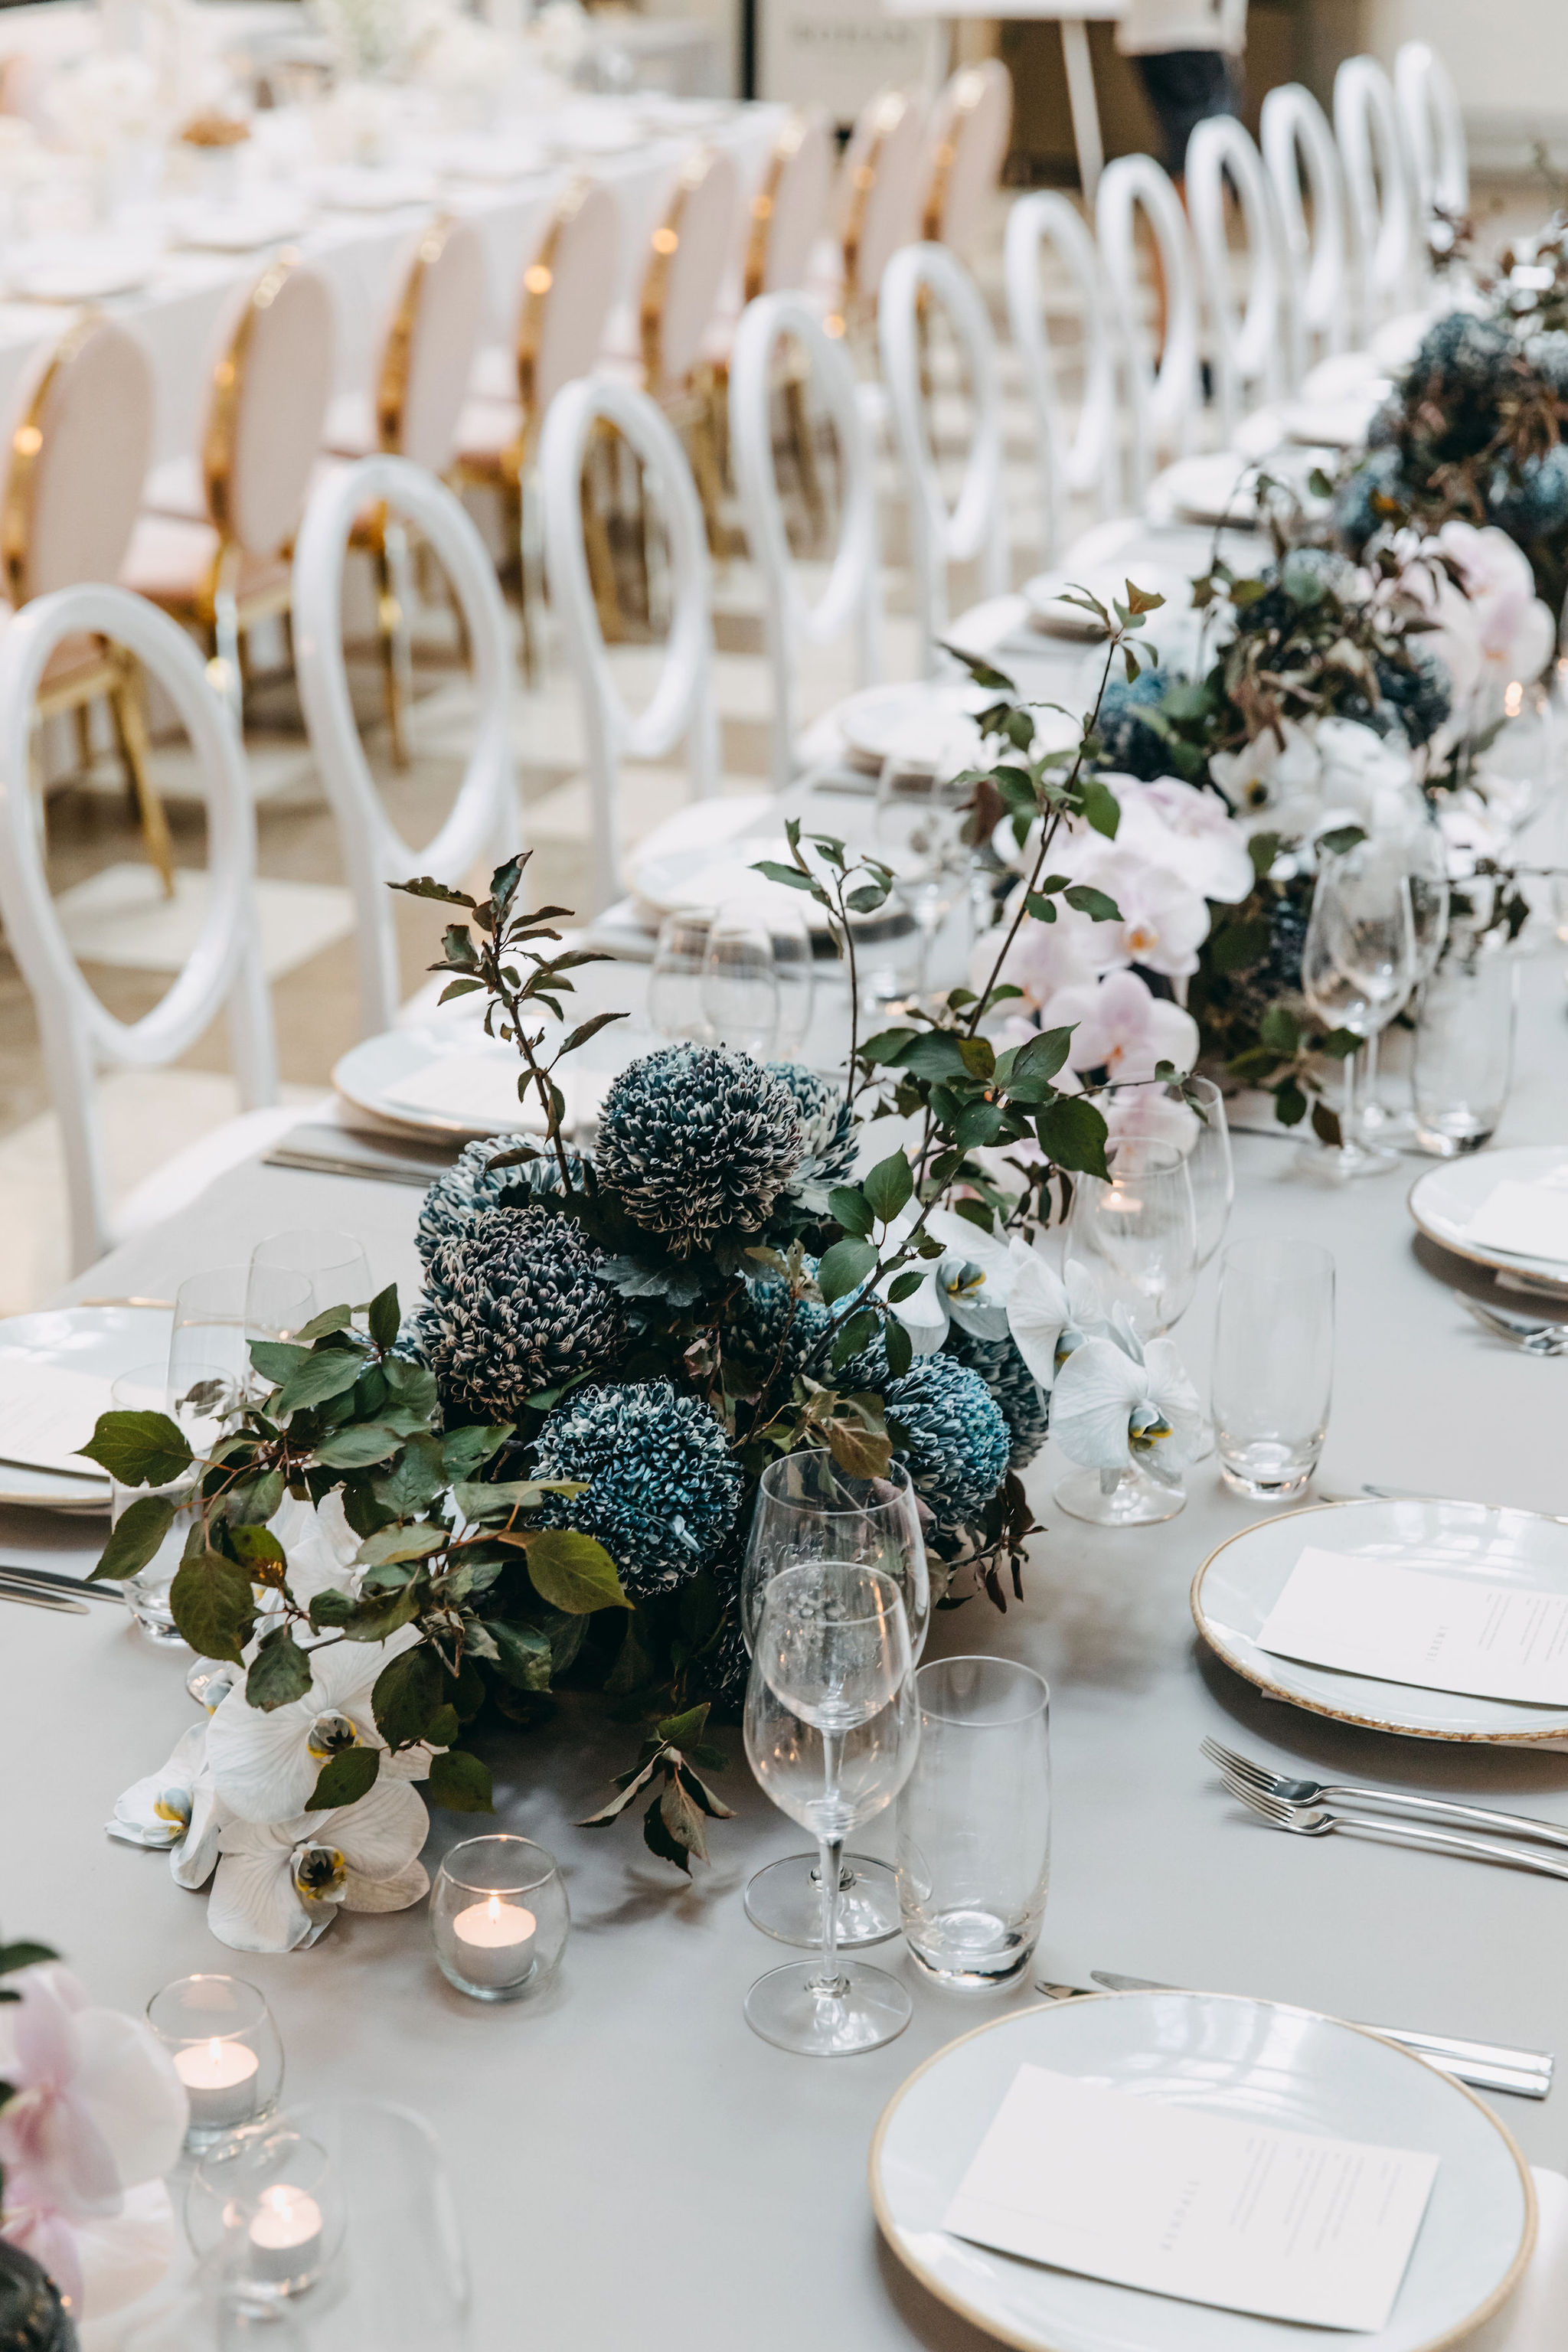 STATEBUILDINGS-WEDDINGOPENDAY-2019_SUPPLIED_076